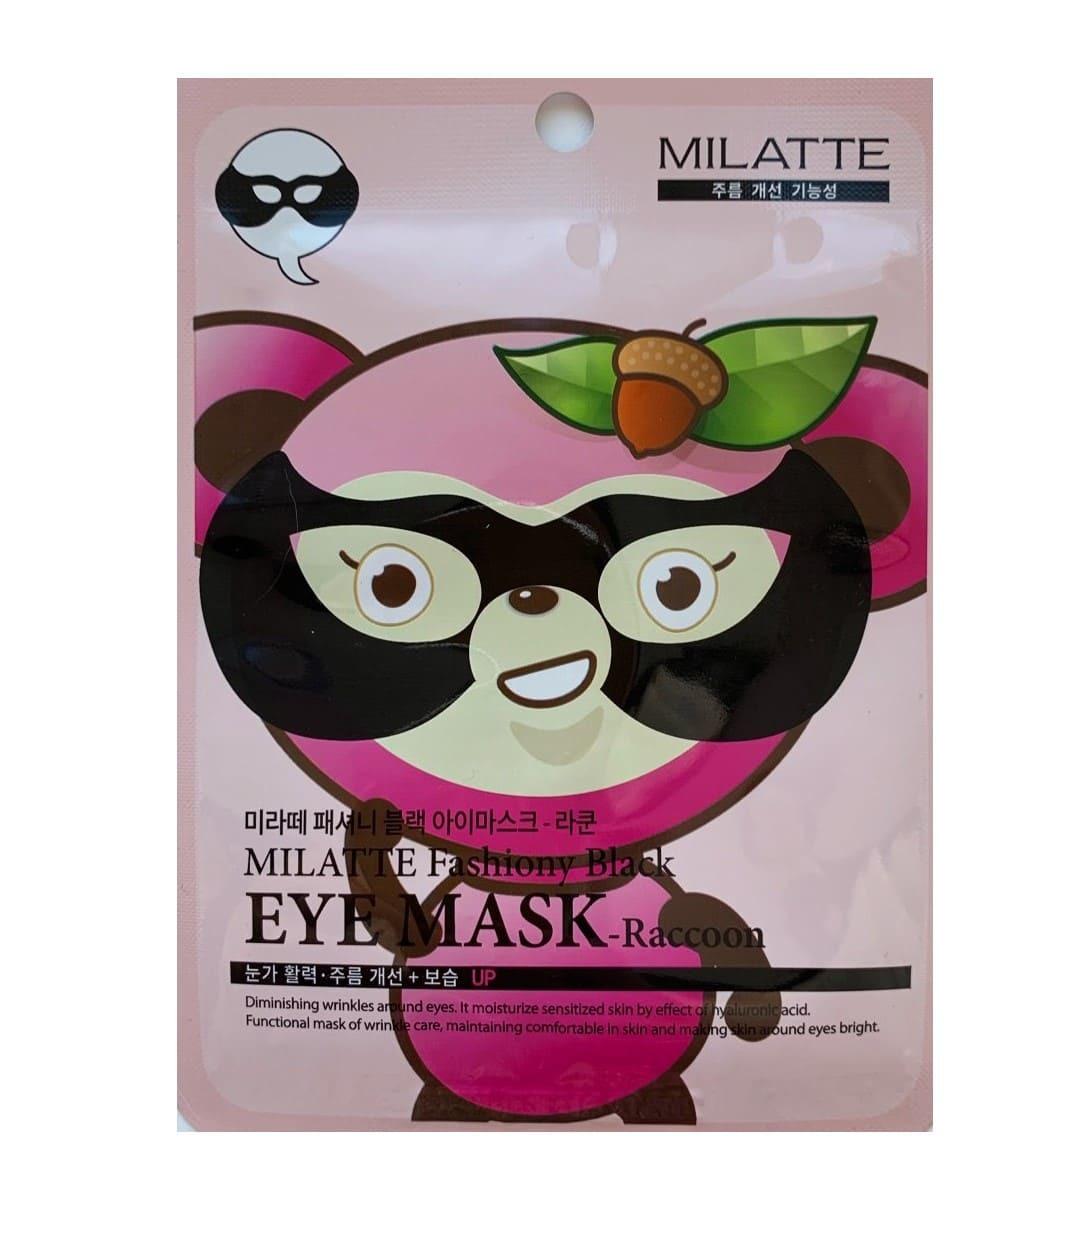 Маска енот - Milatte Fashiony Black Eye Mask Raccoon